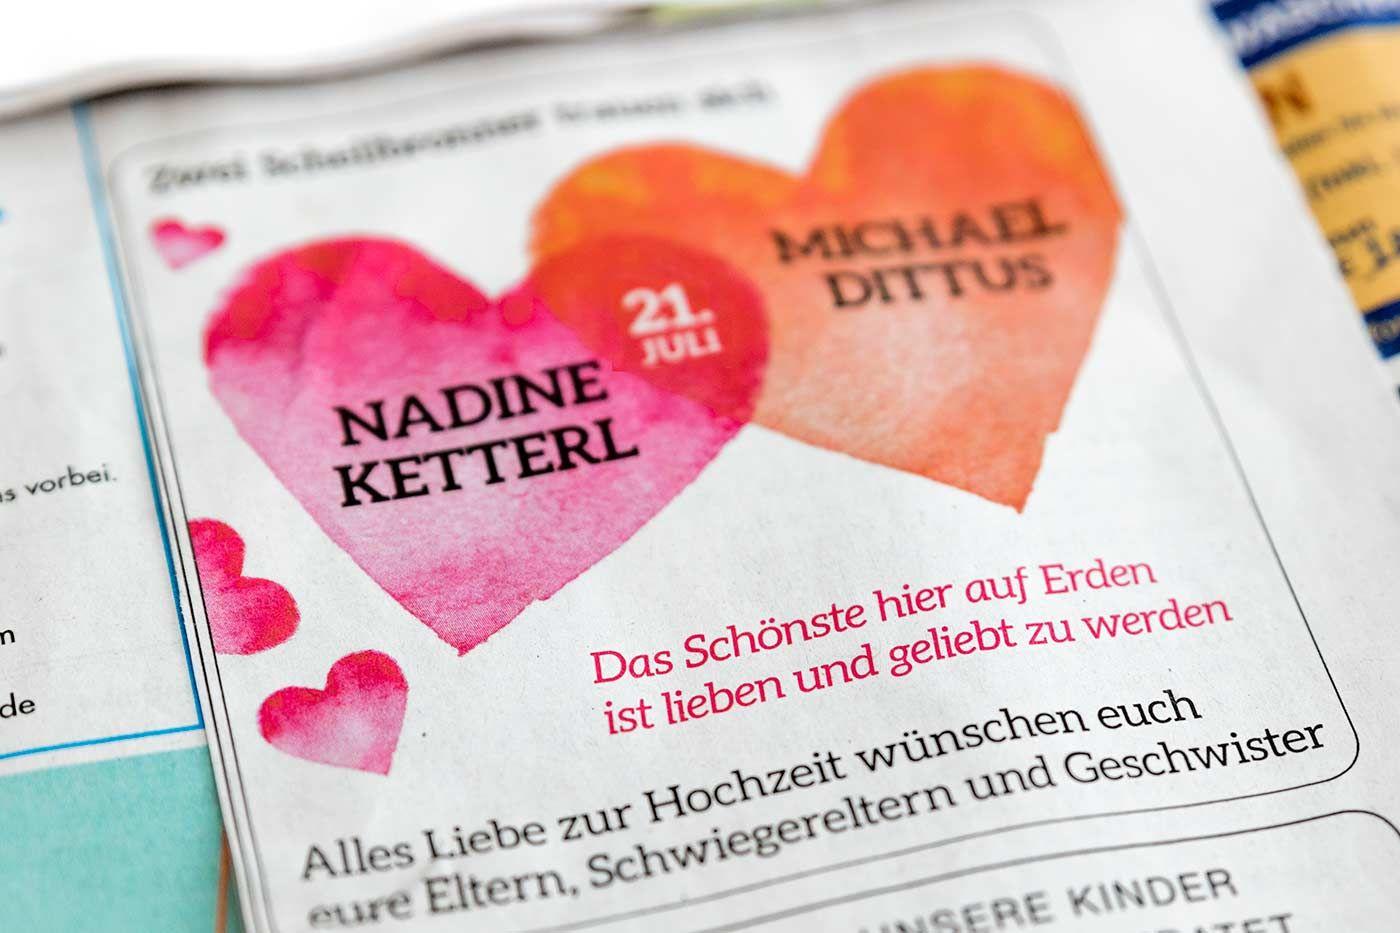 Textideen Fur Eure Hochzeitsanzeige Hochzeitsanzeige Hochzeit Alles Liebe Zur Hochzeit